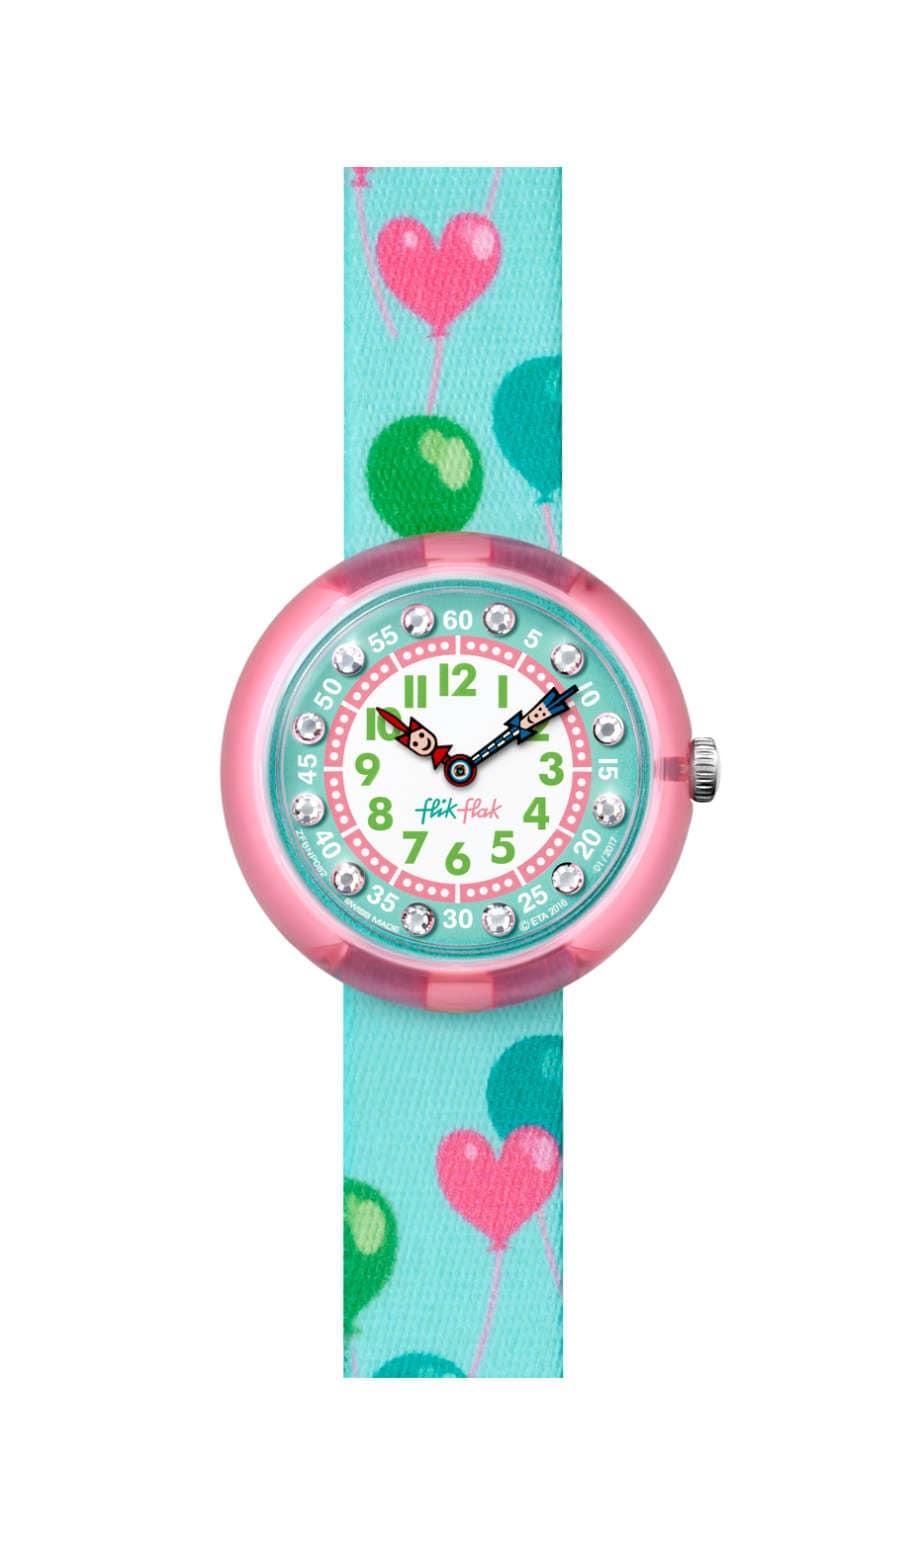 Swatch - BALLOLA - 1